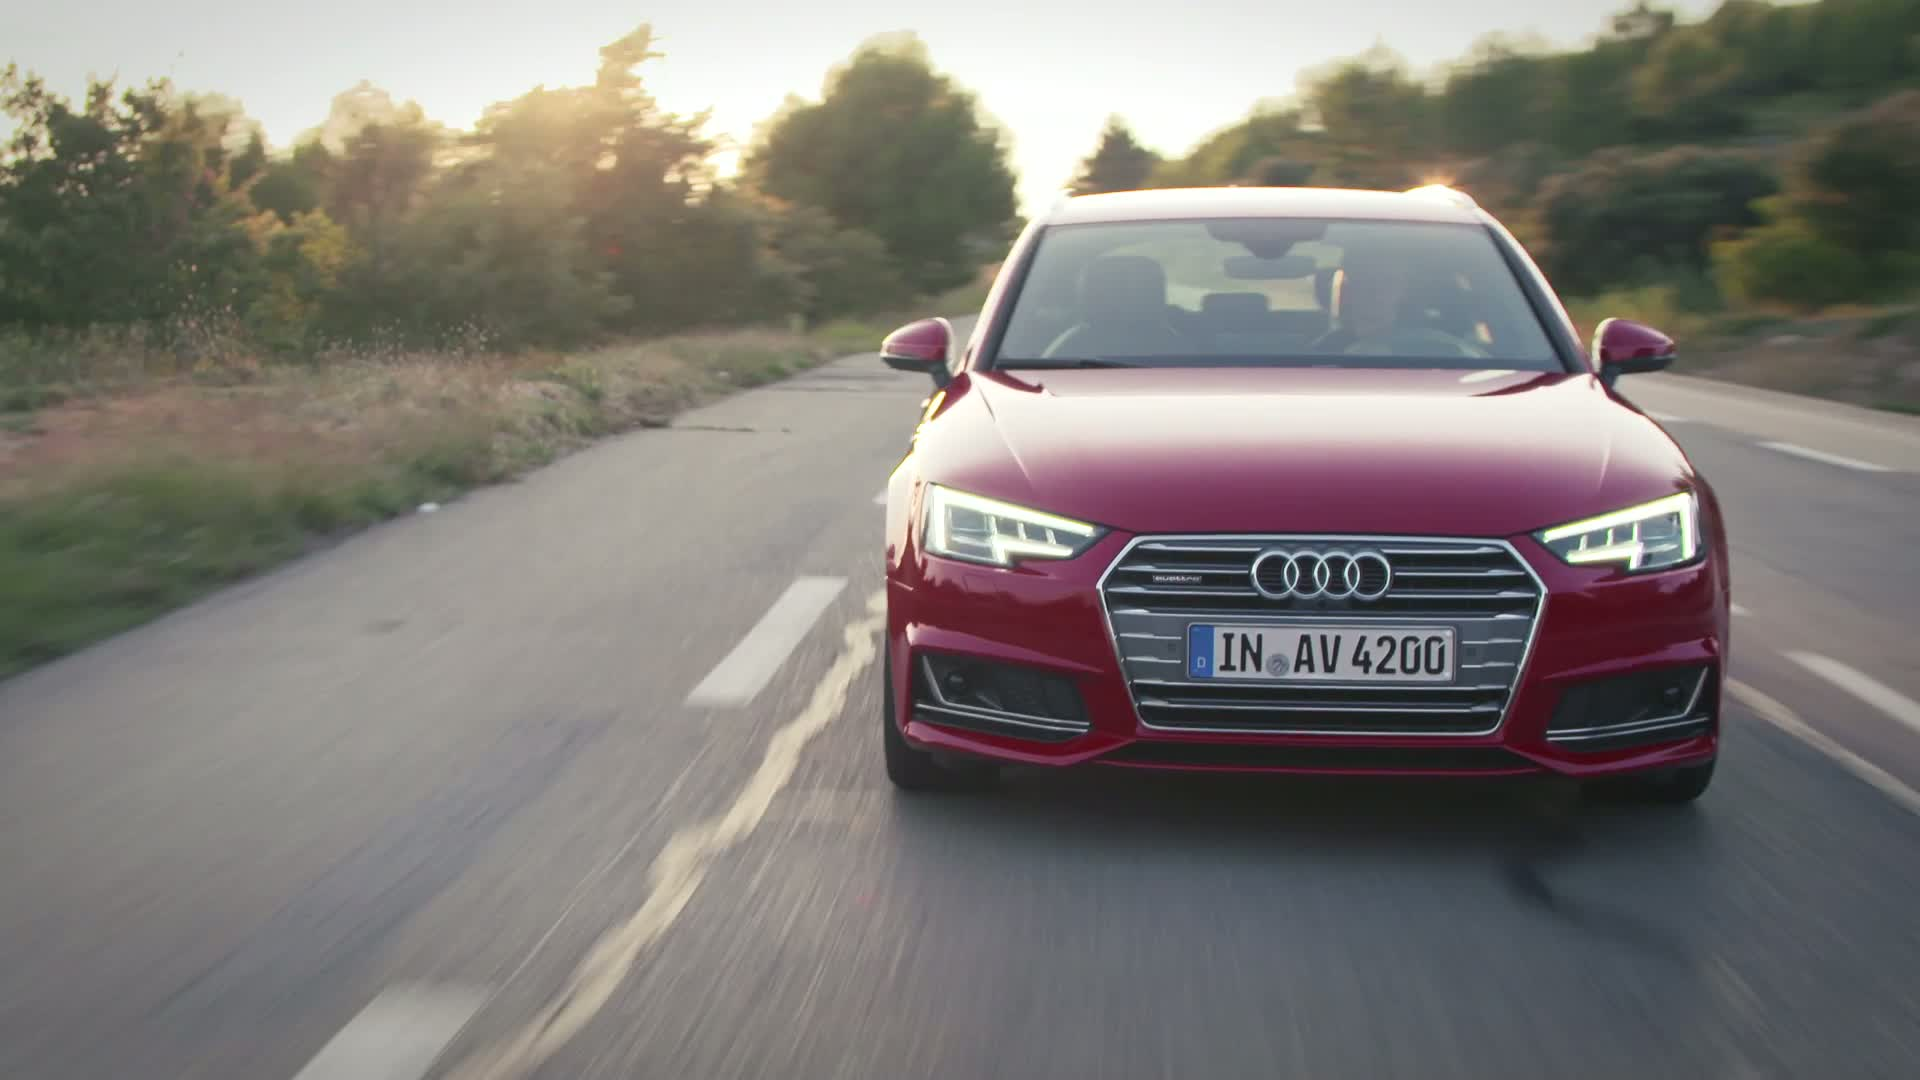 Audi A4 Avant - Trailer